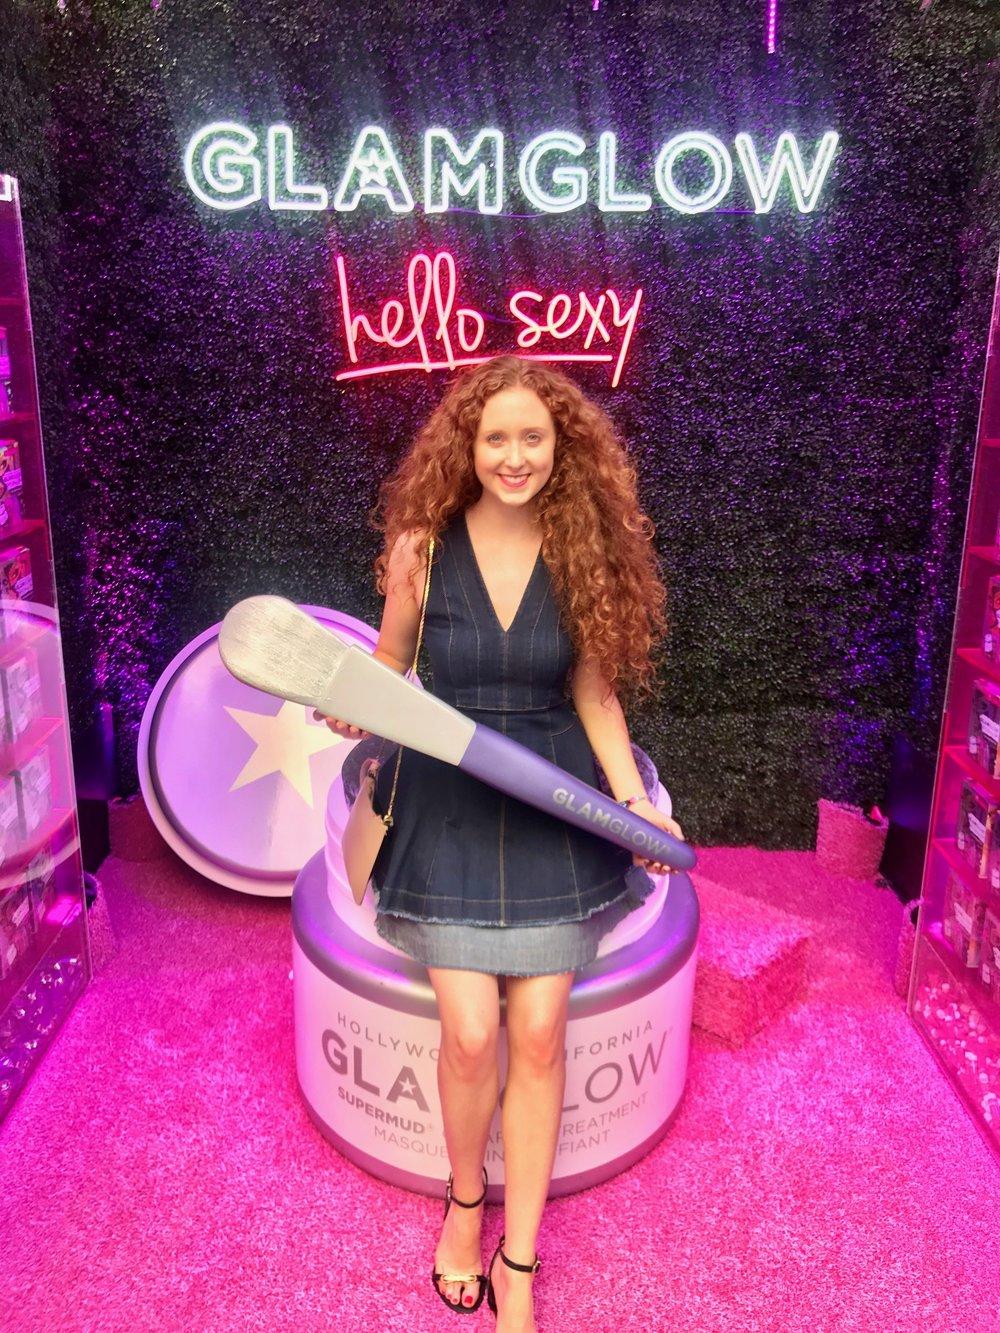 Glam Glow Heaven